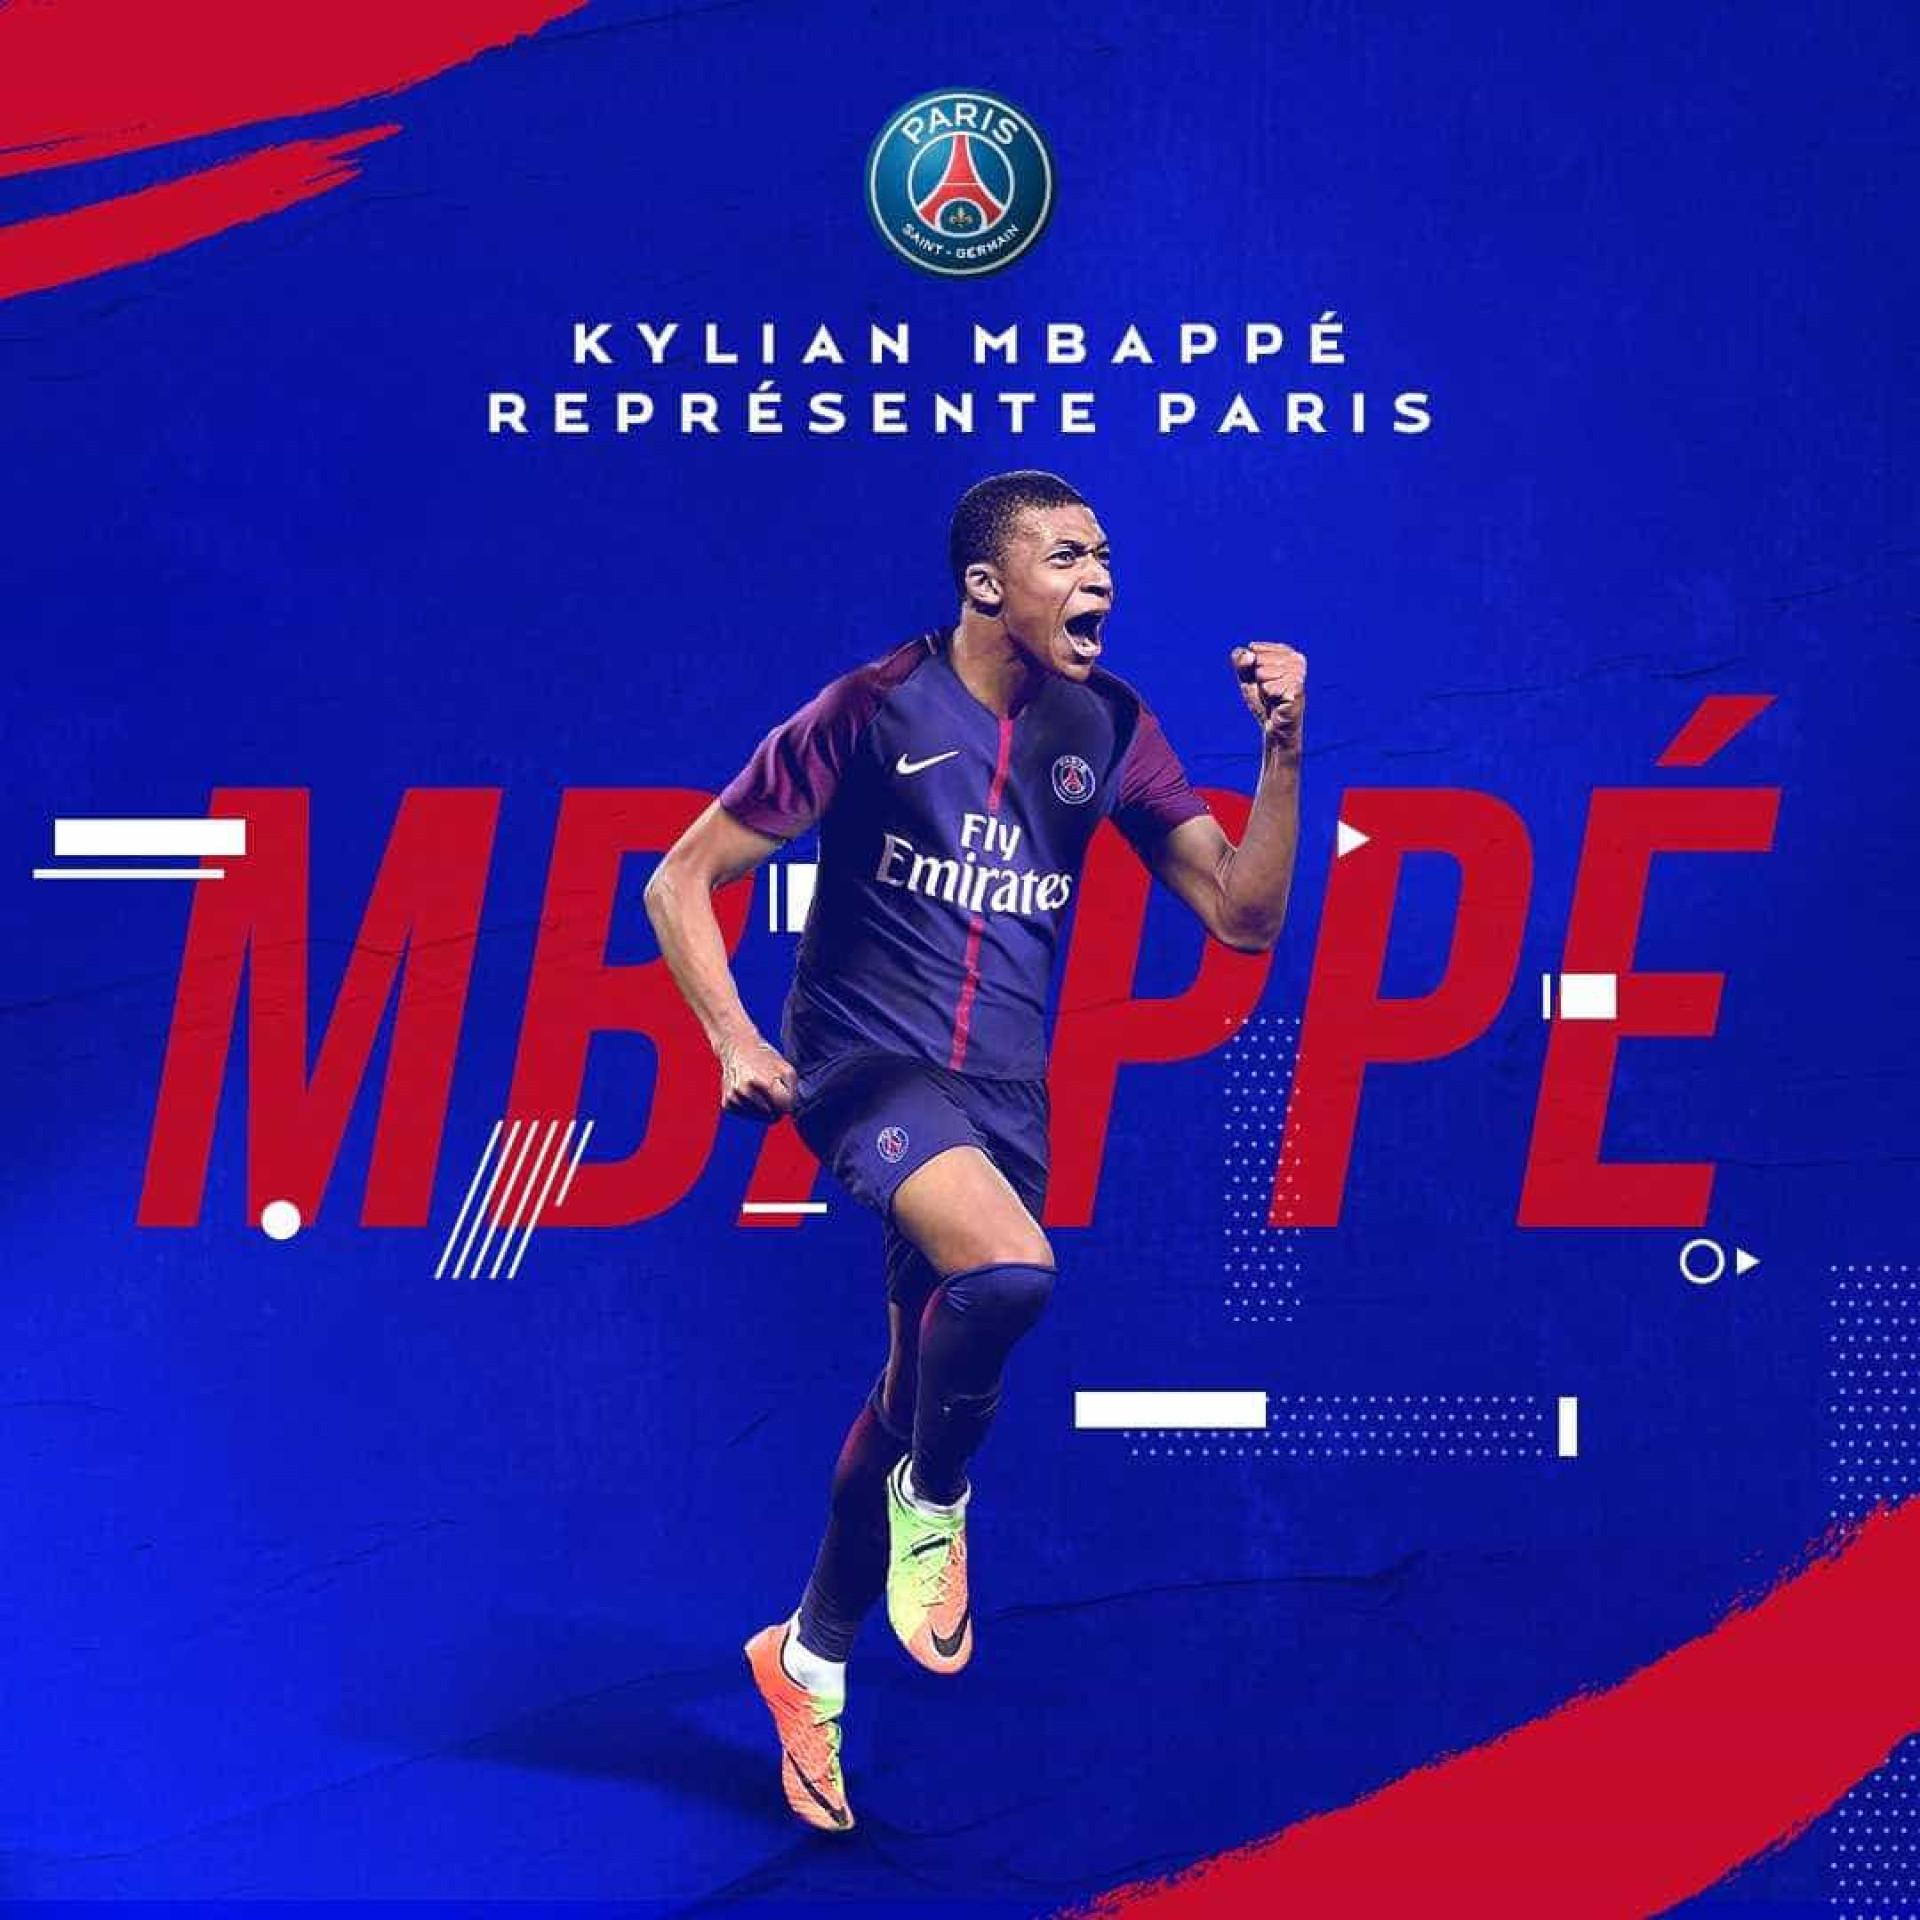 Oficial: Paris Saint-Germain anuncia contratação de Mbappé